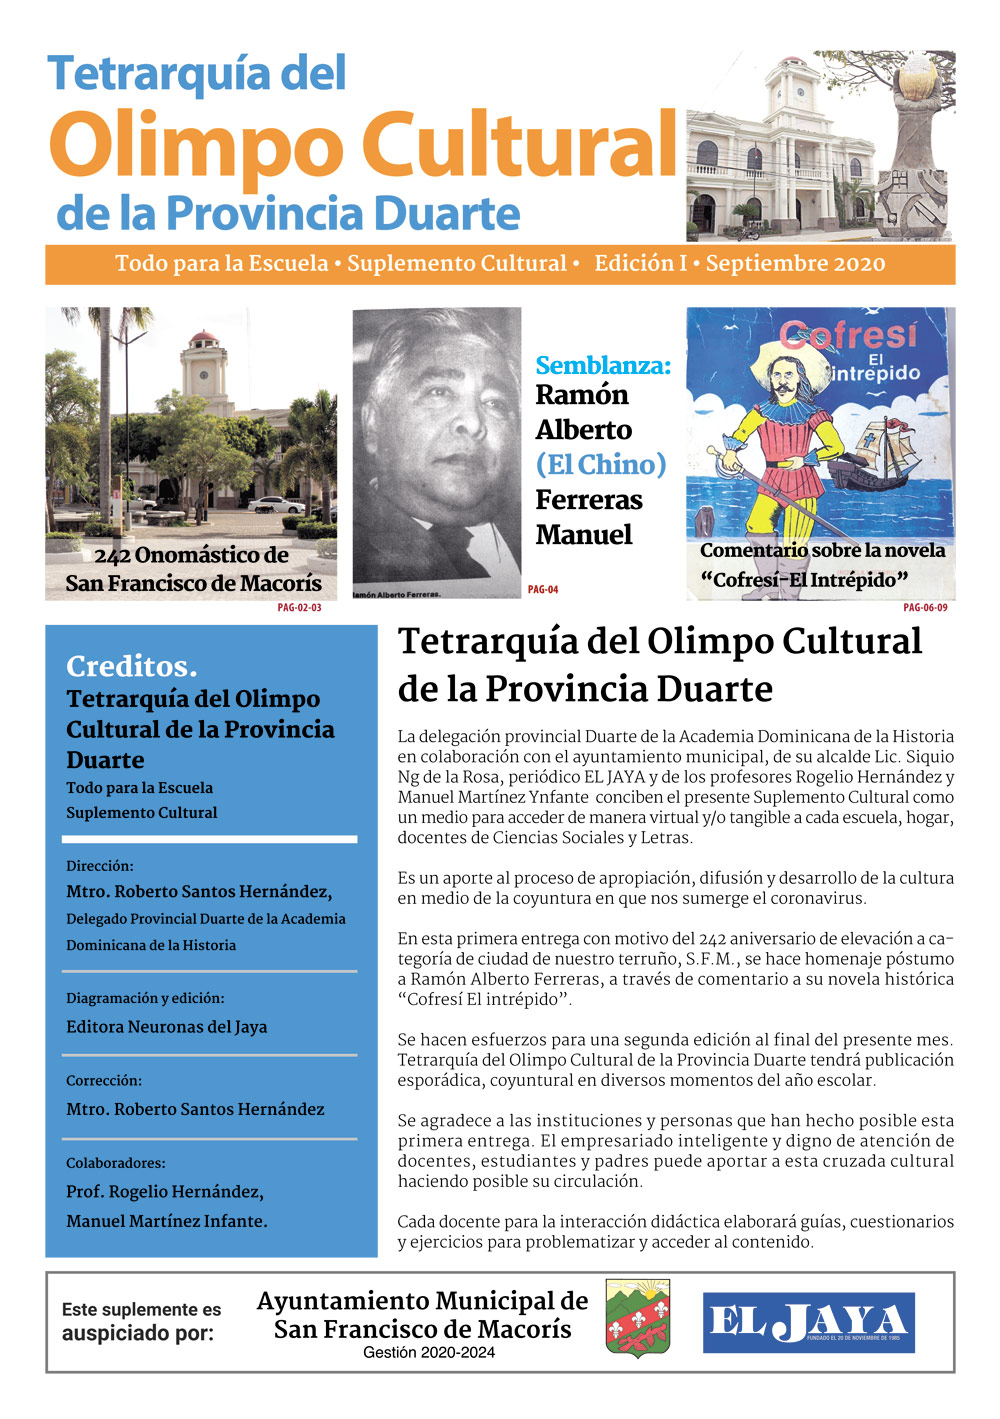 Tetrarquía del Olimpo Cultural de la Provincia Duarte